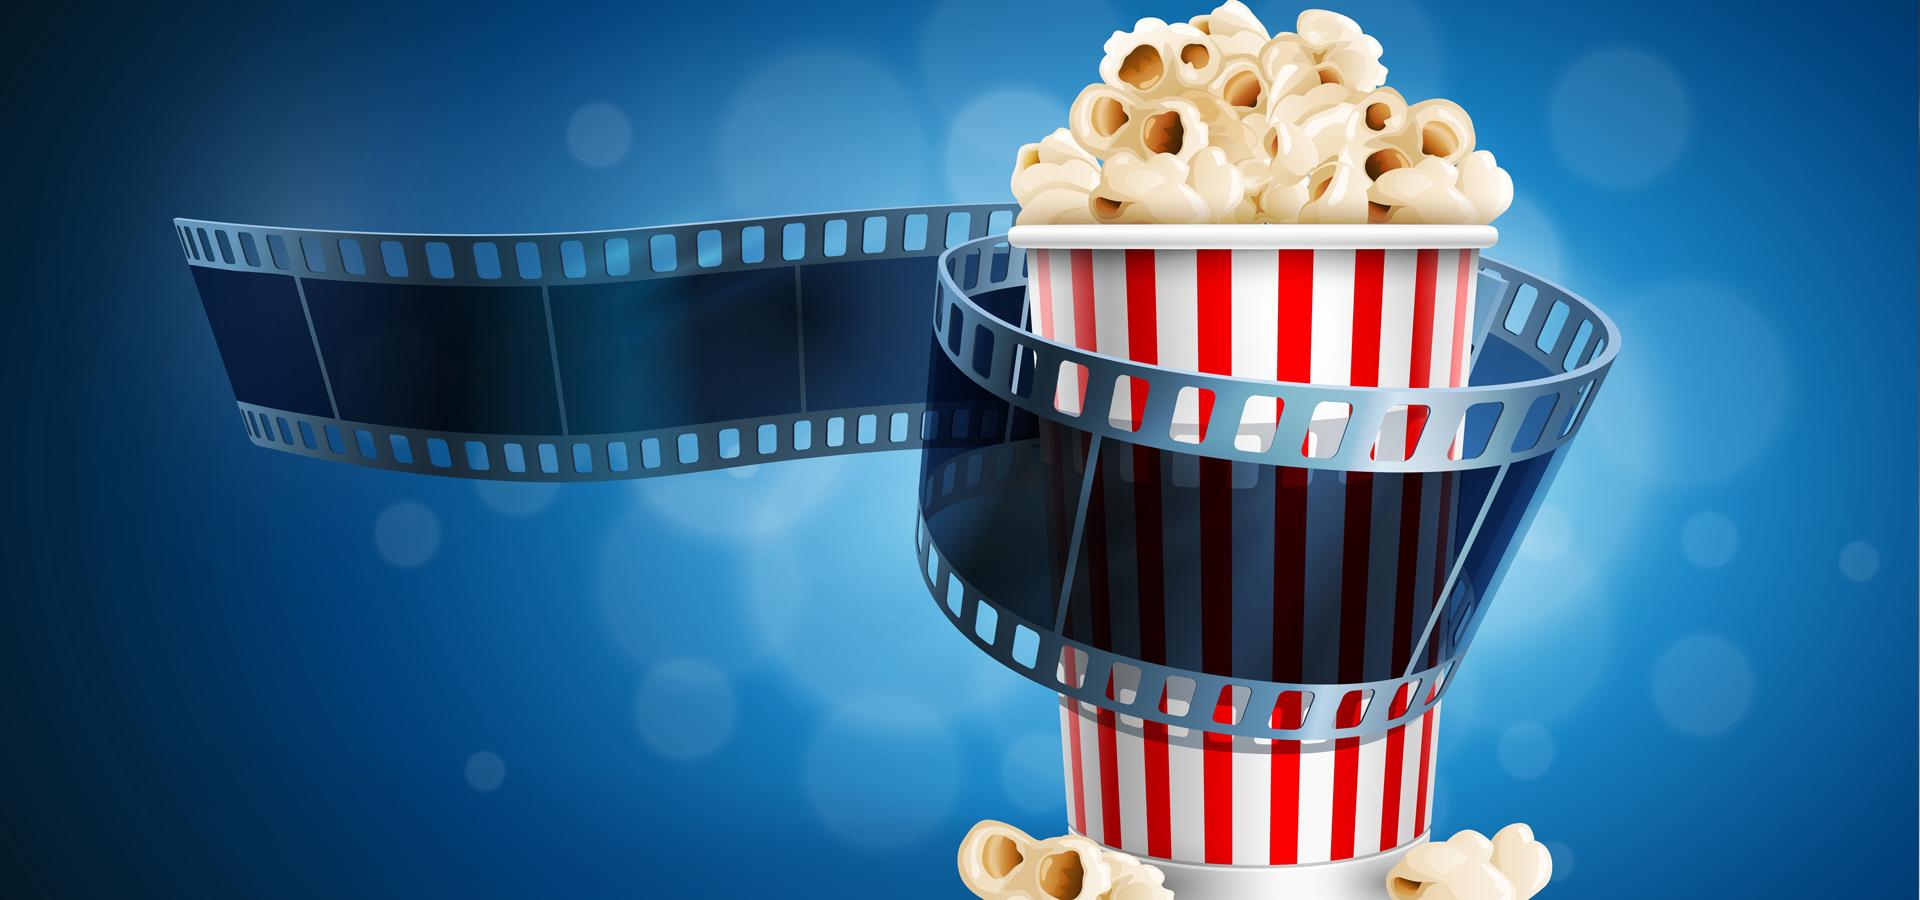 Movie Popcorn Background  Film  Popcorn  3d Background